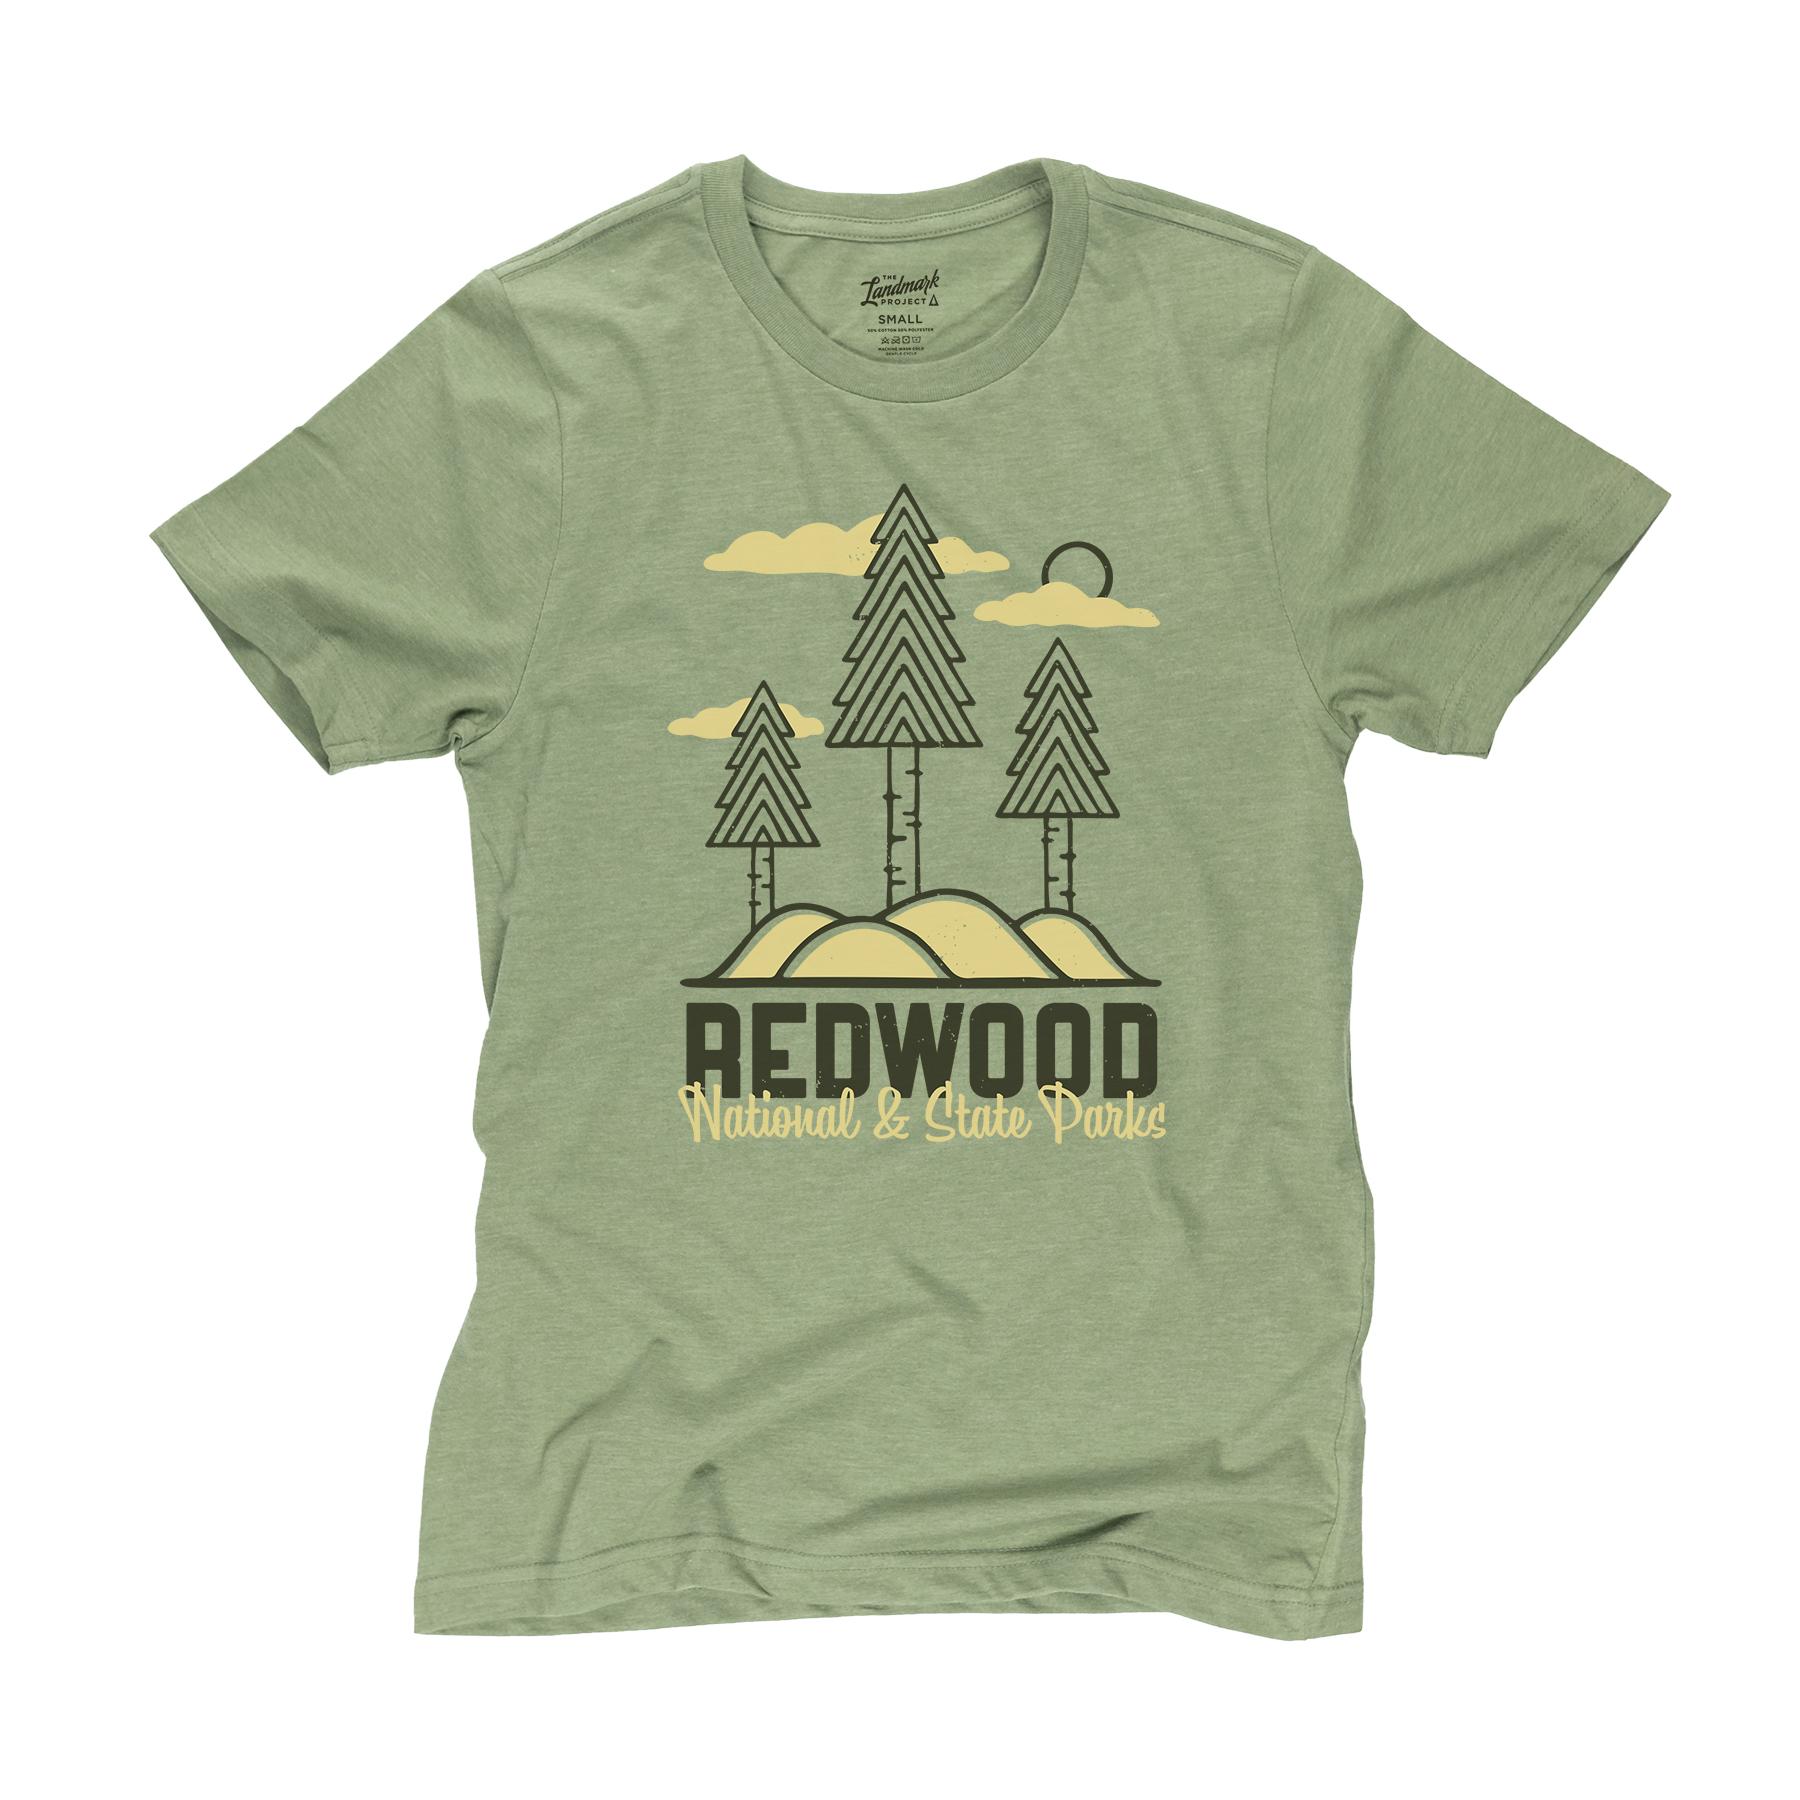 redwood-motif-cactus-tee.jpg